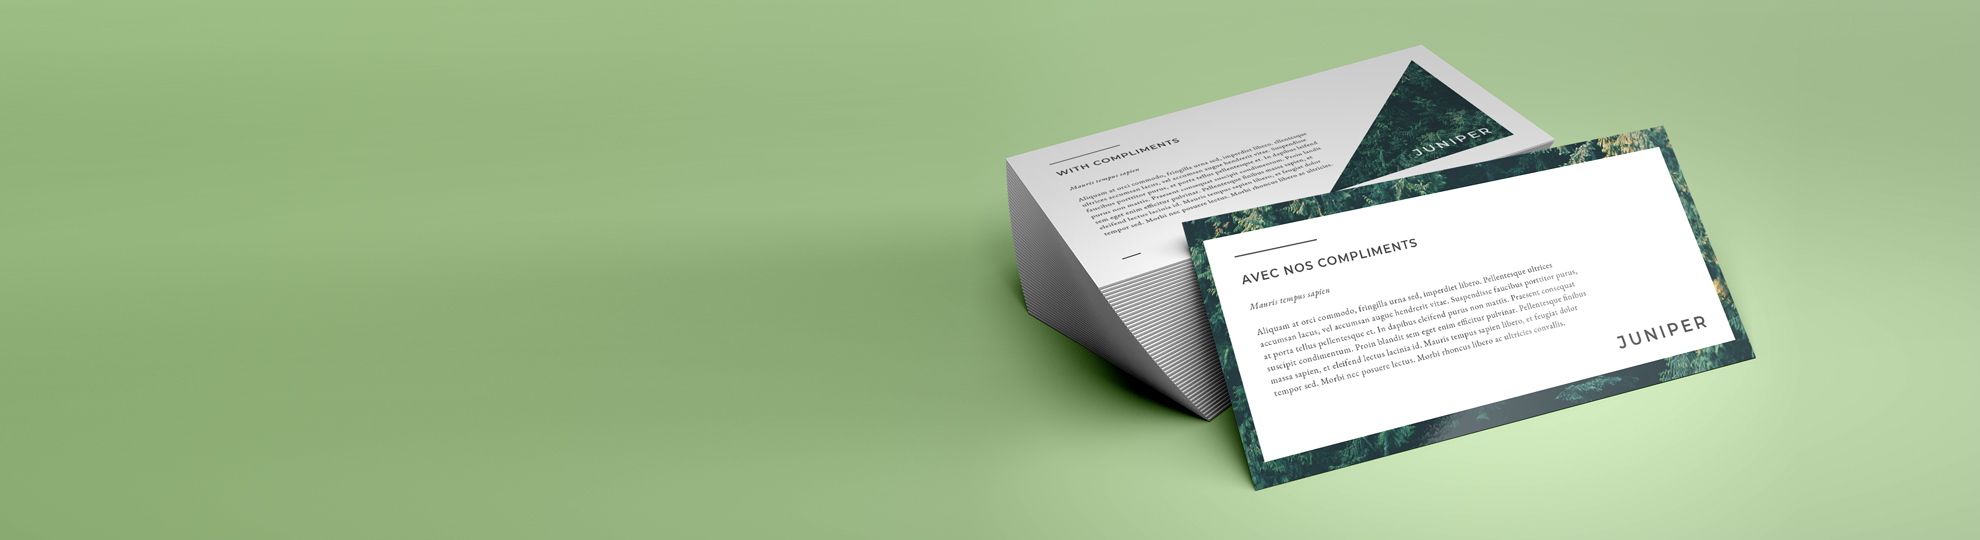 Imprimer cartes de correspondance recyclé